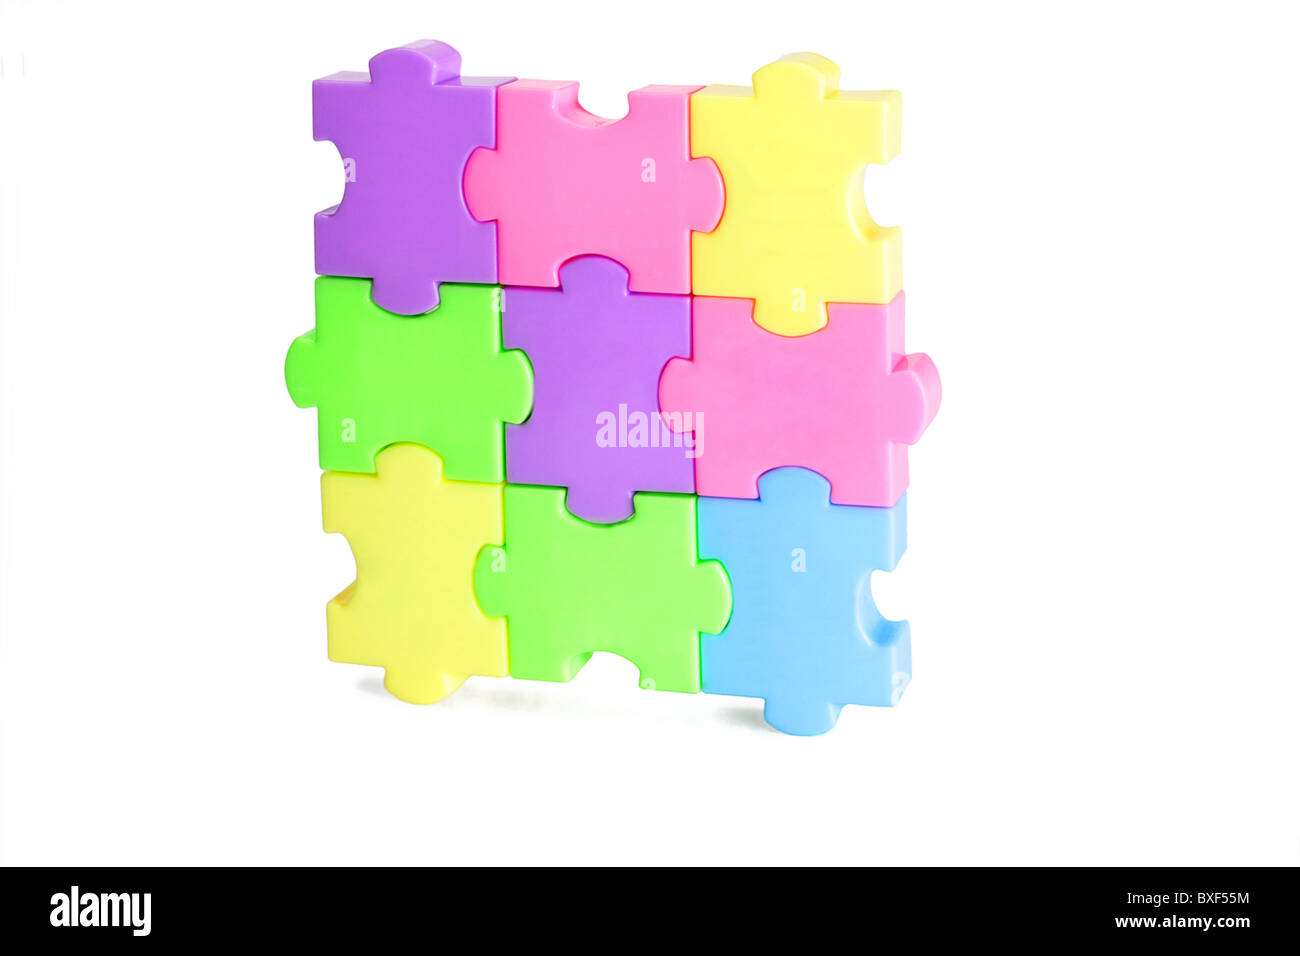 Colorful plastic jigsaw puzzle blocks on white background - Stock Image